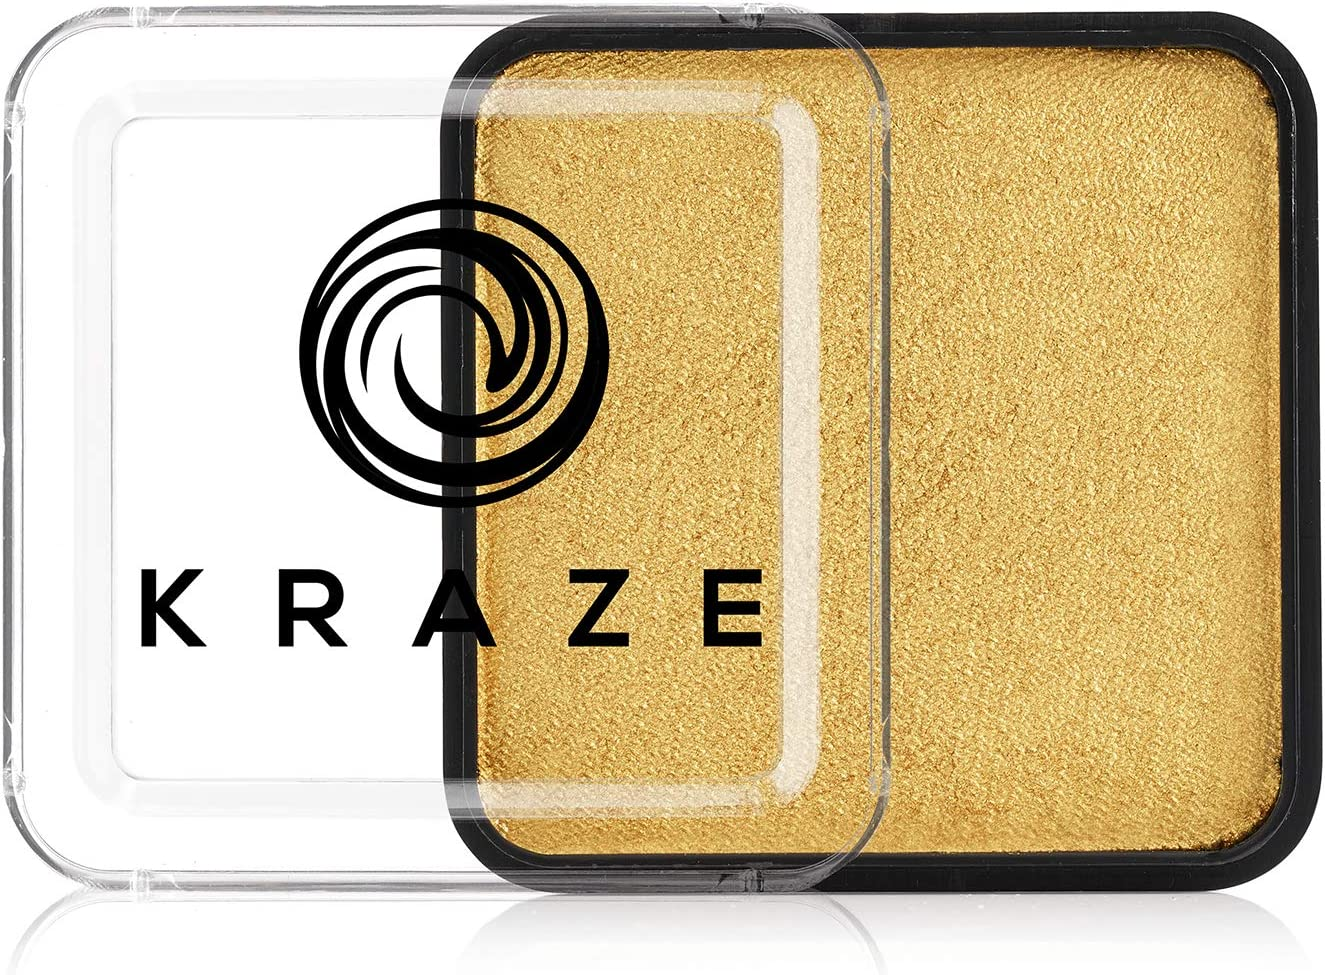 25% OFF Kraze FX Square - Metallic Gold gm Fashionable Paint Hypoallerge Face 25